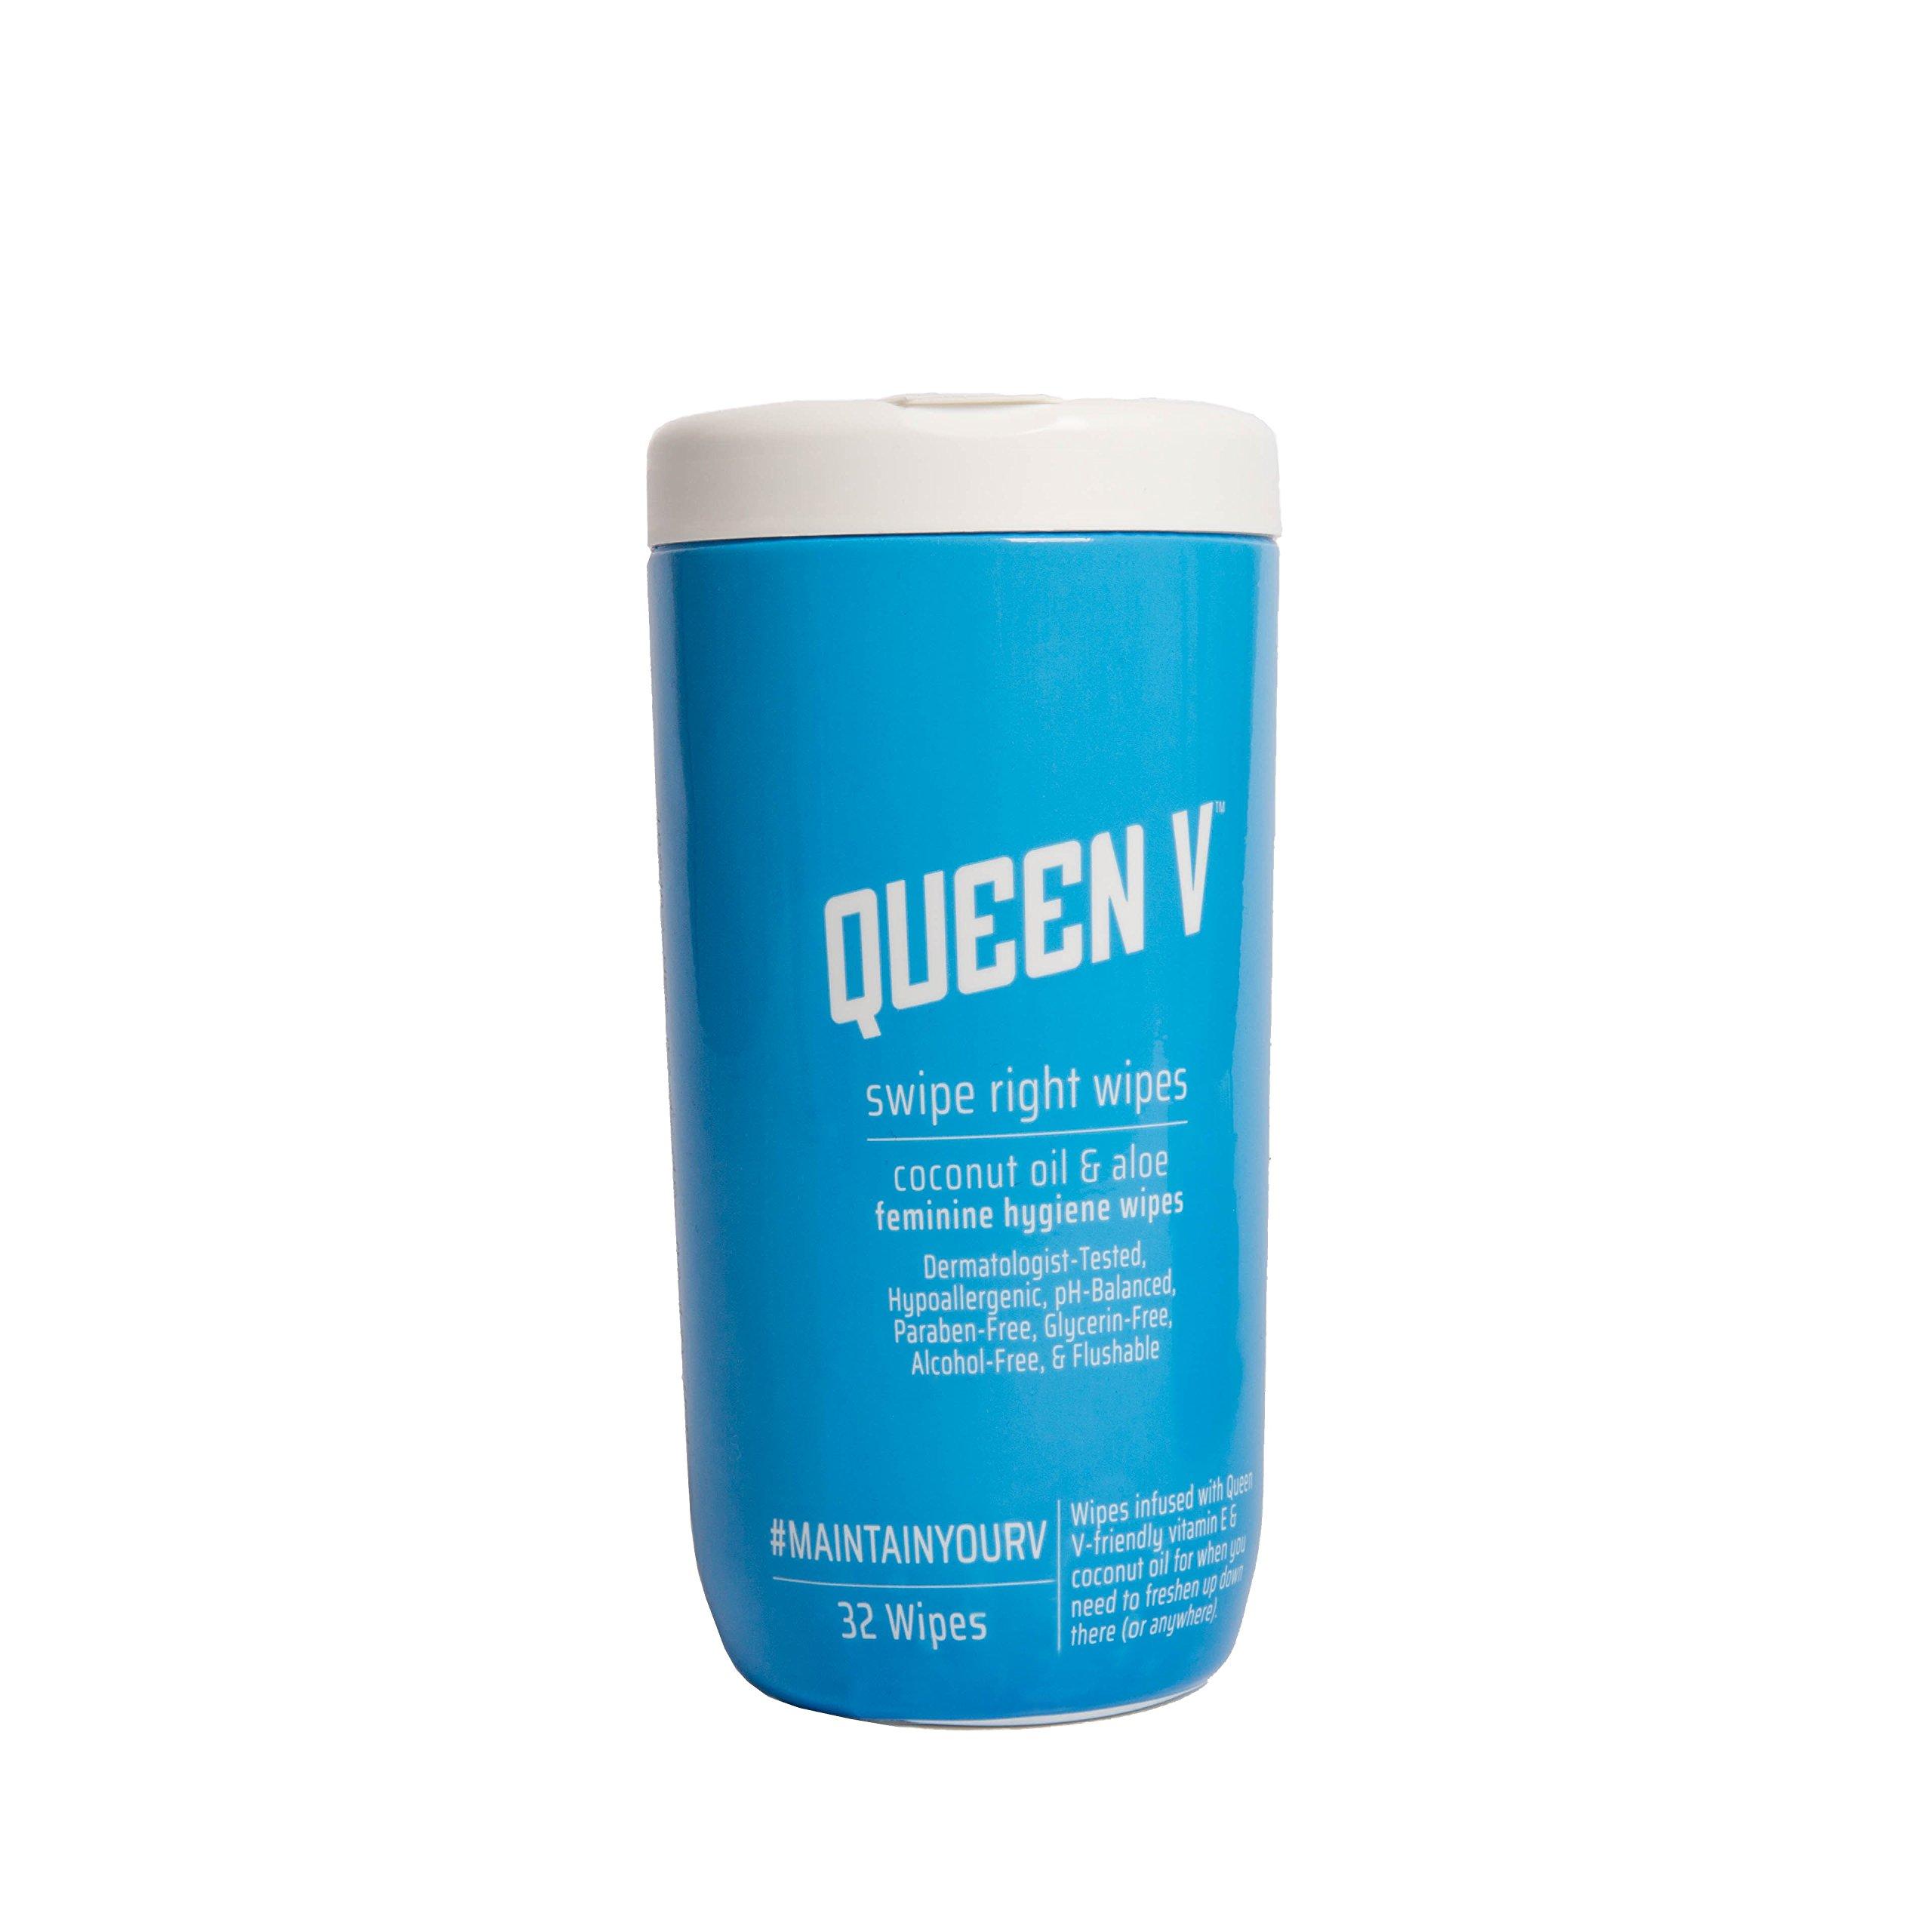 Queen V Swipe Right Feminine Hygiene, Coconut Oil & Aloe, 32 Wipes